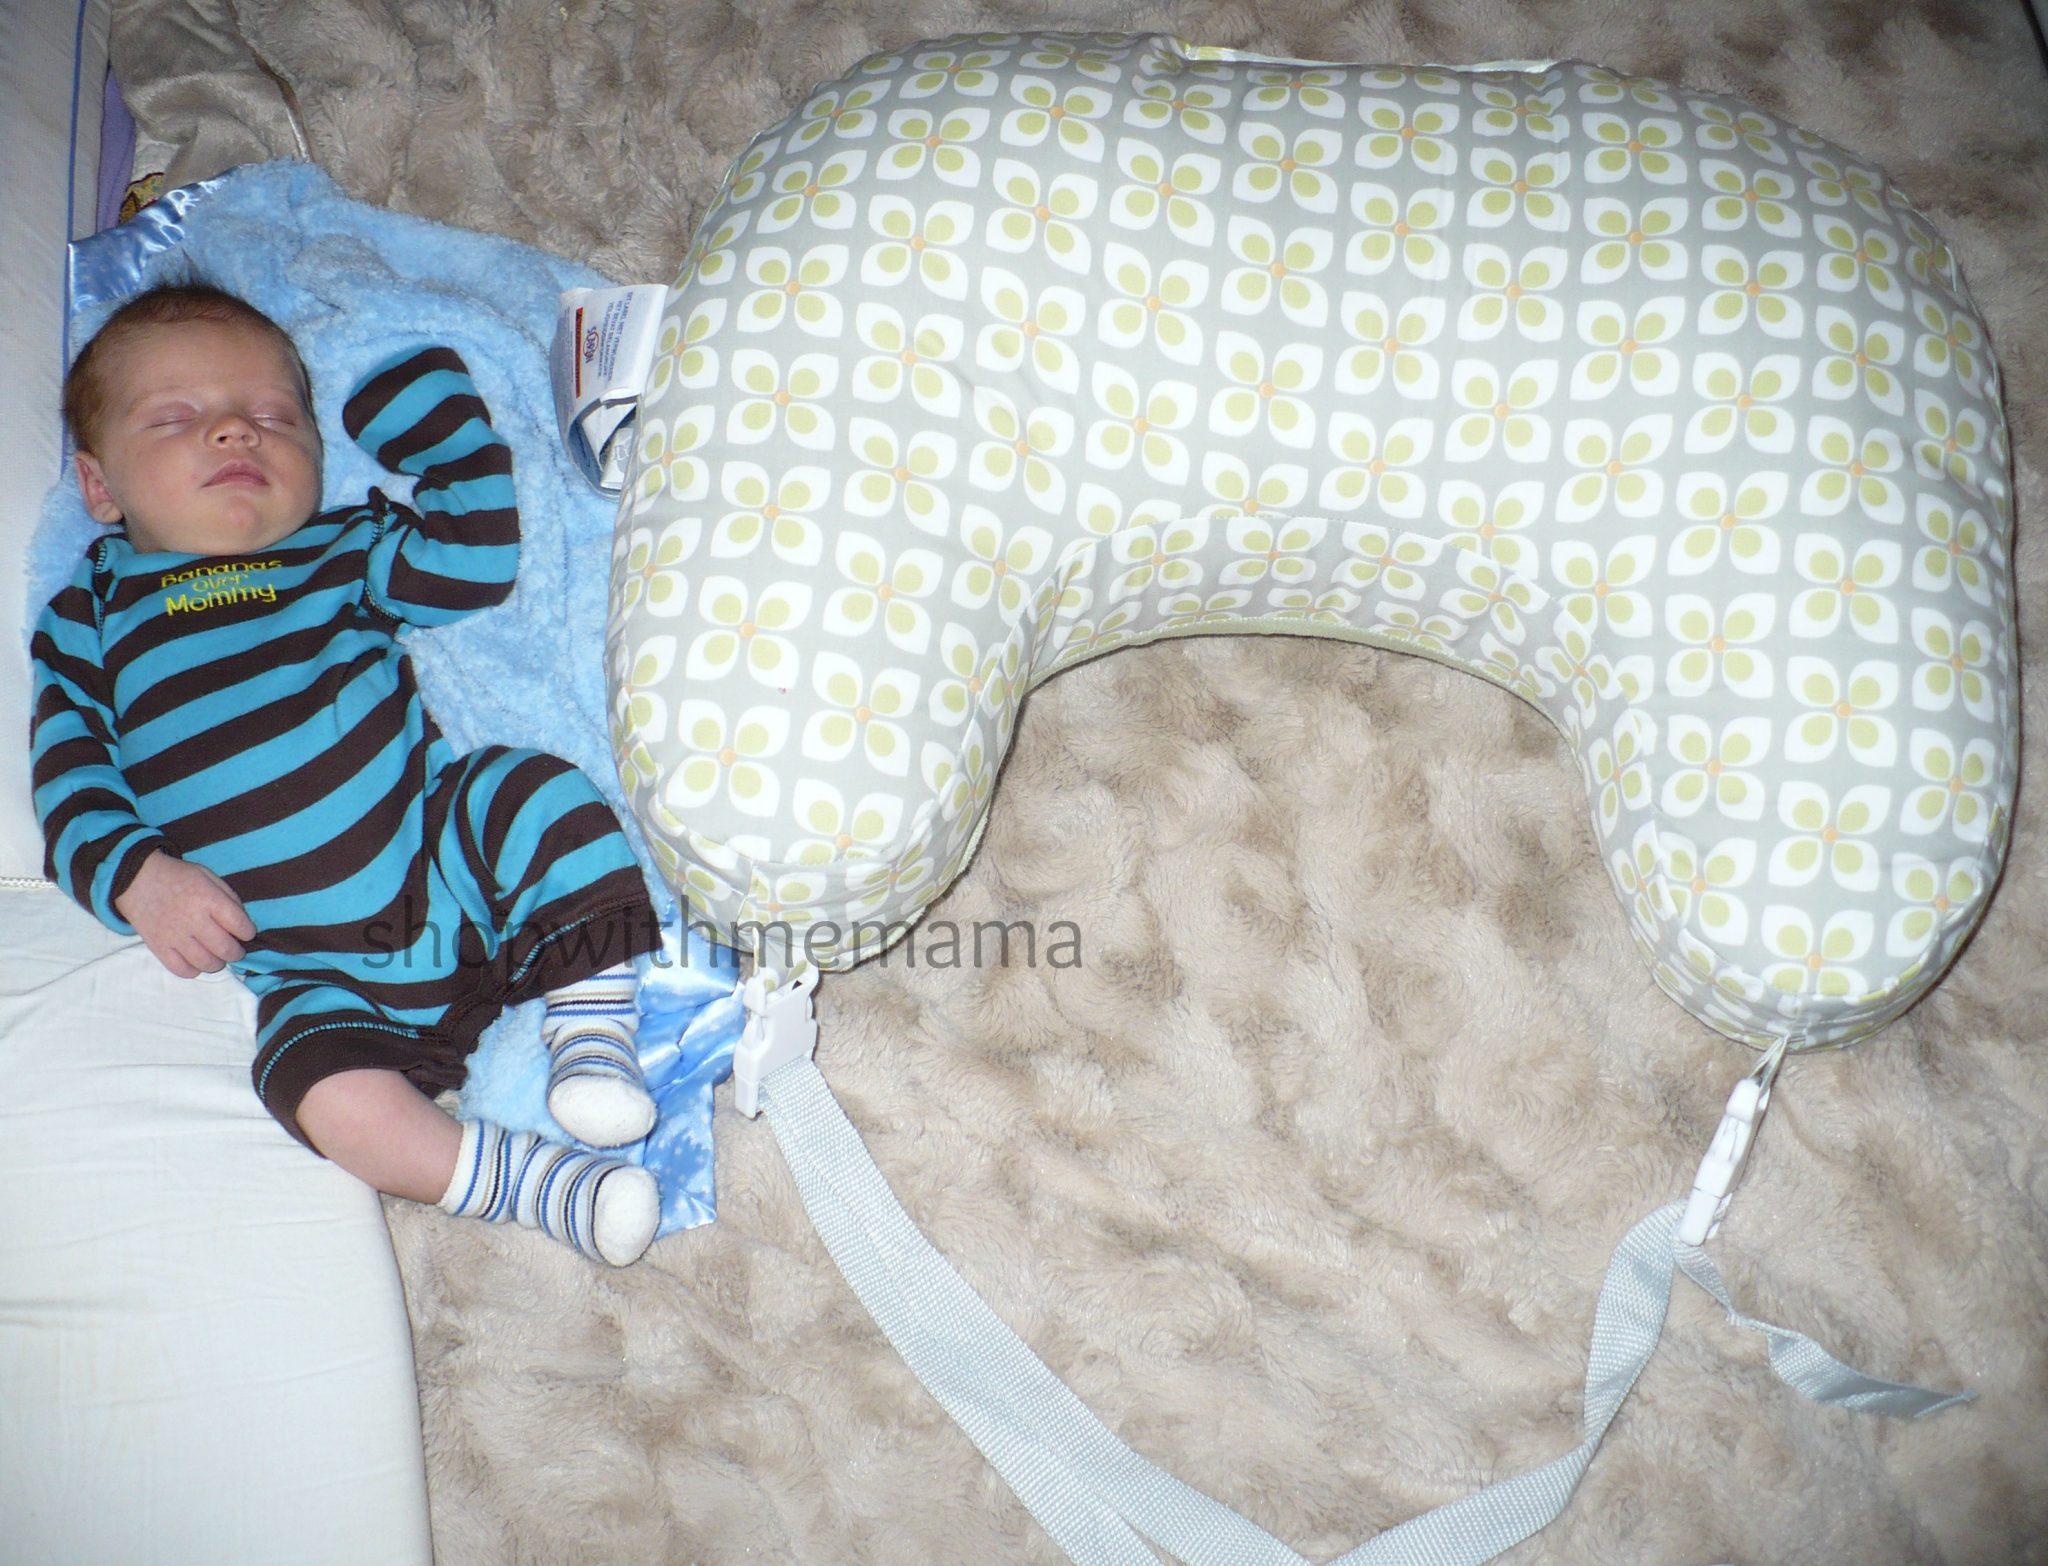 Boppy Two-Sided Breastfeeding Pillow